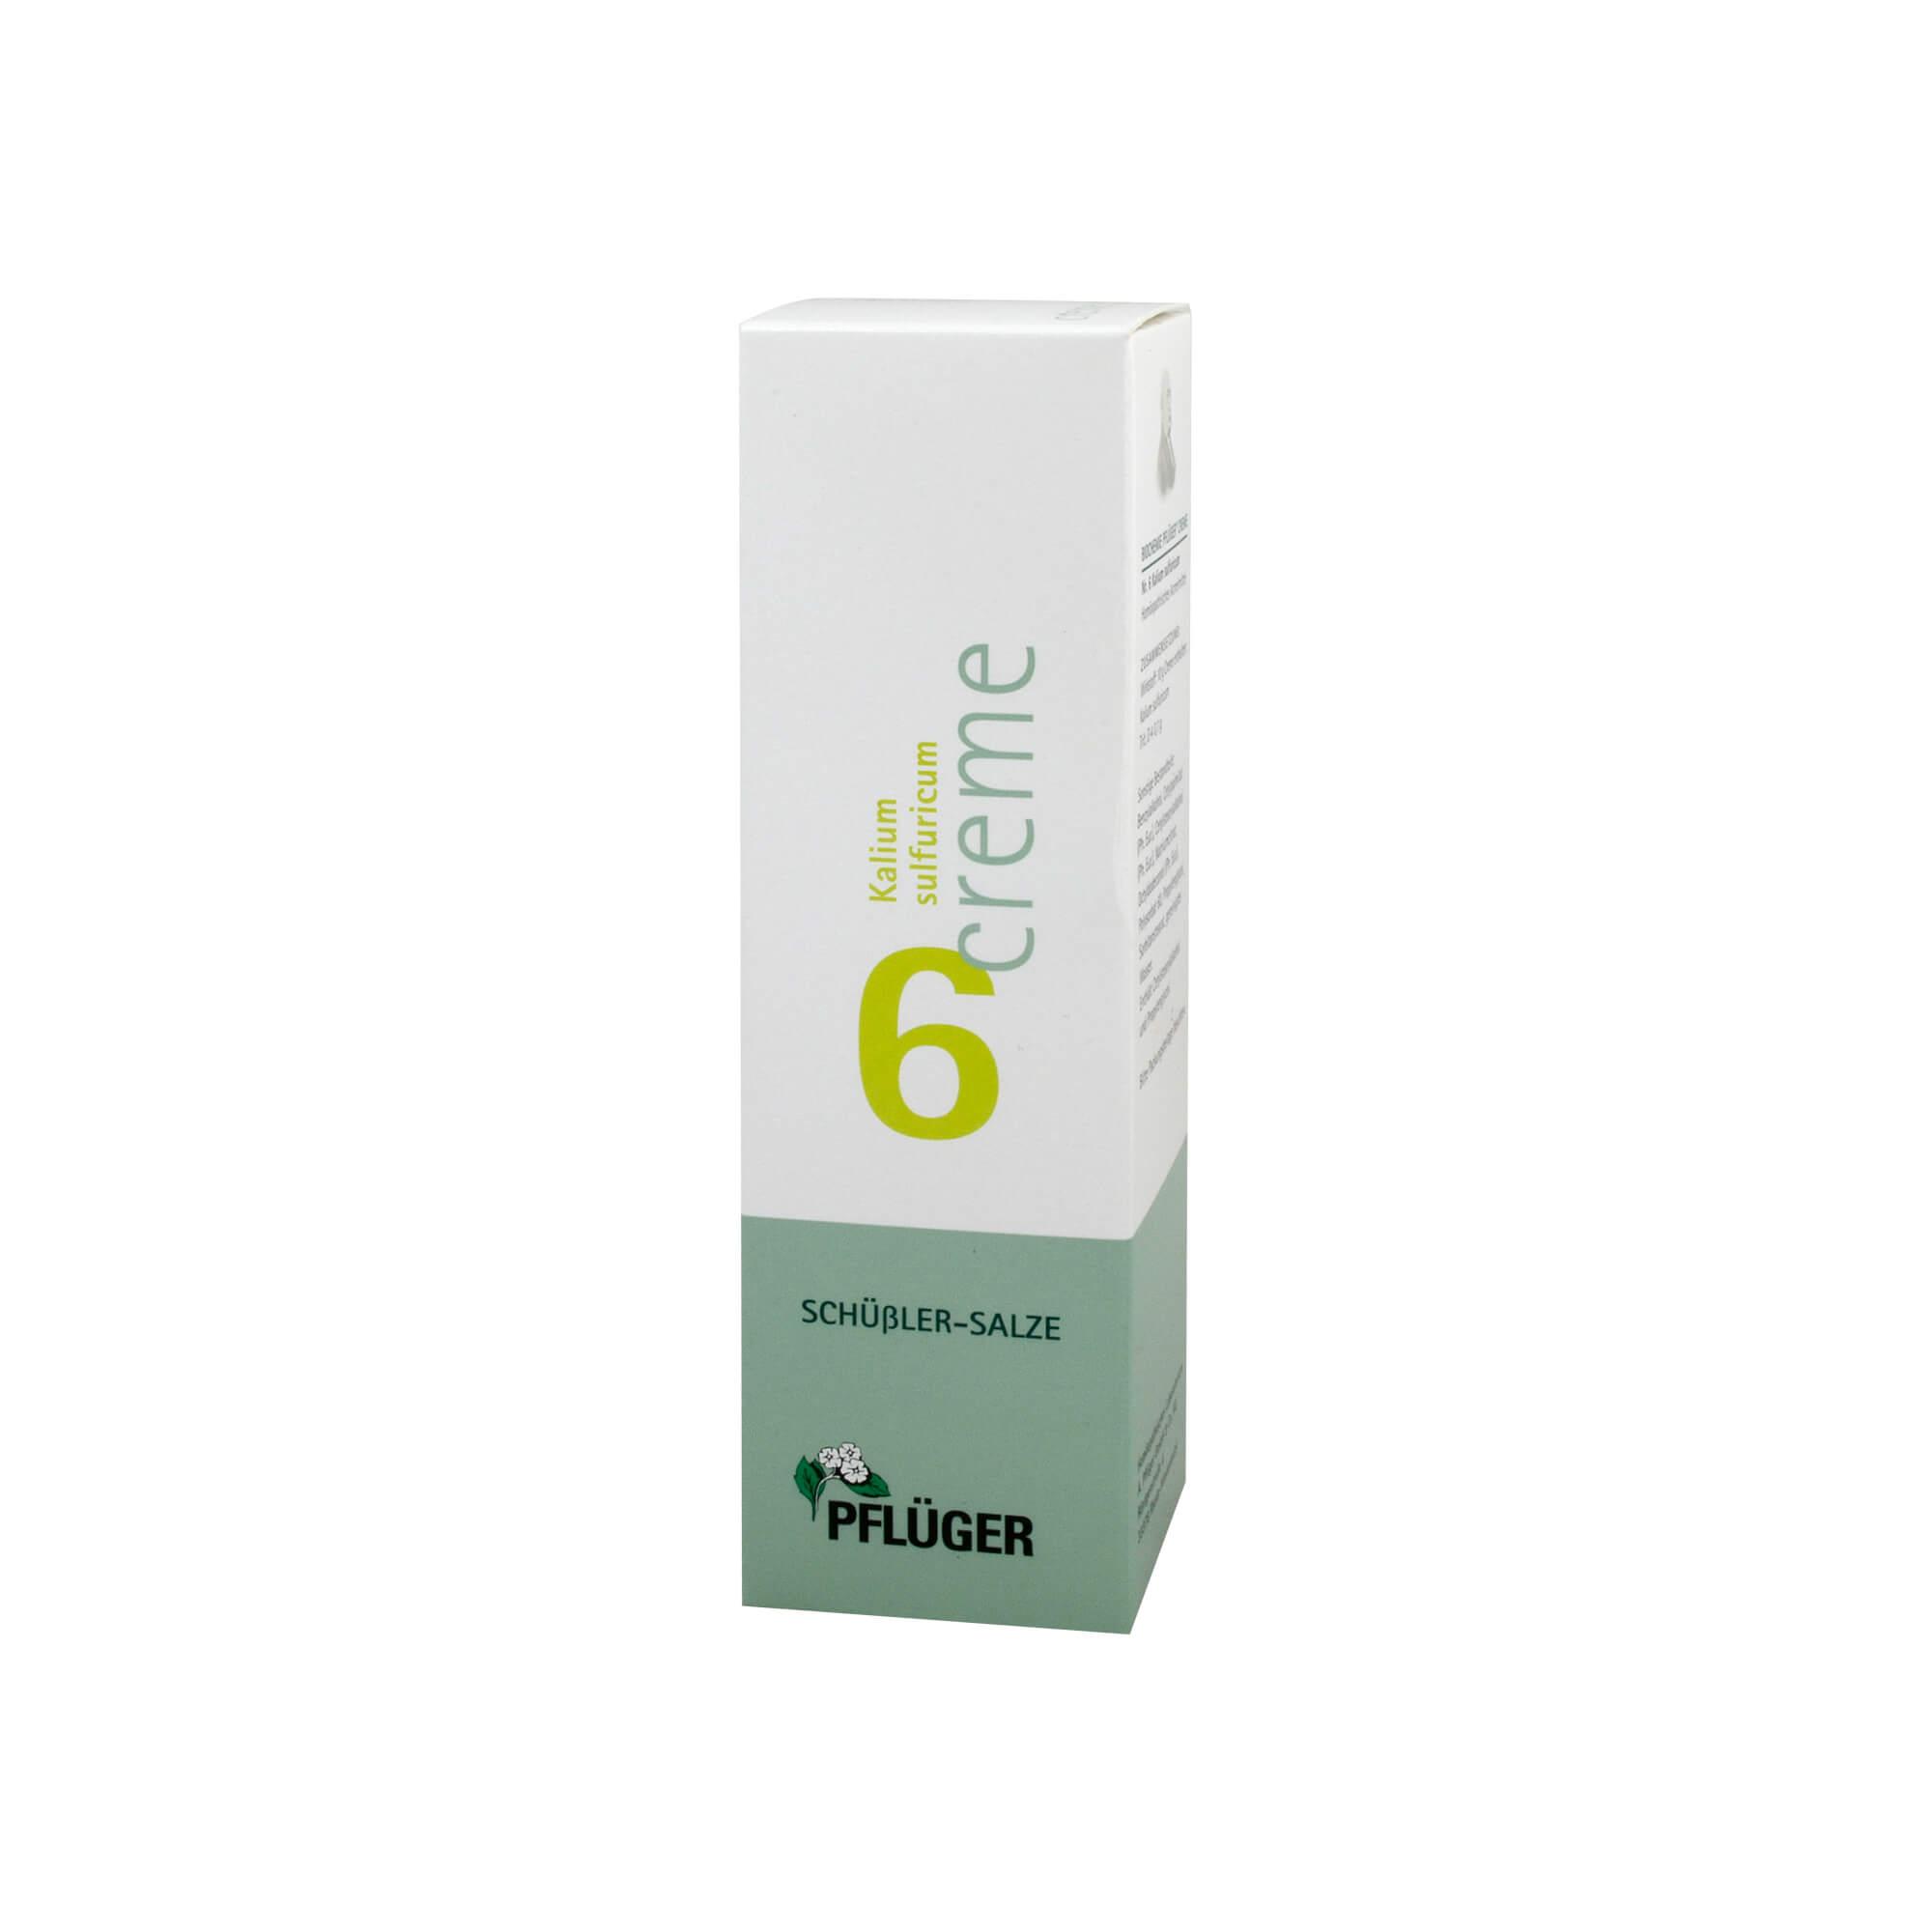 Biochemie Pflüger 6 Kalium Sulfur. Creme